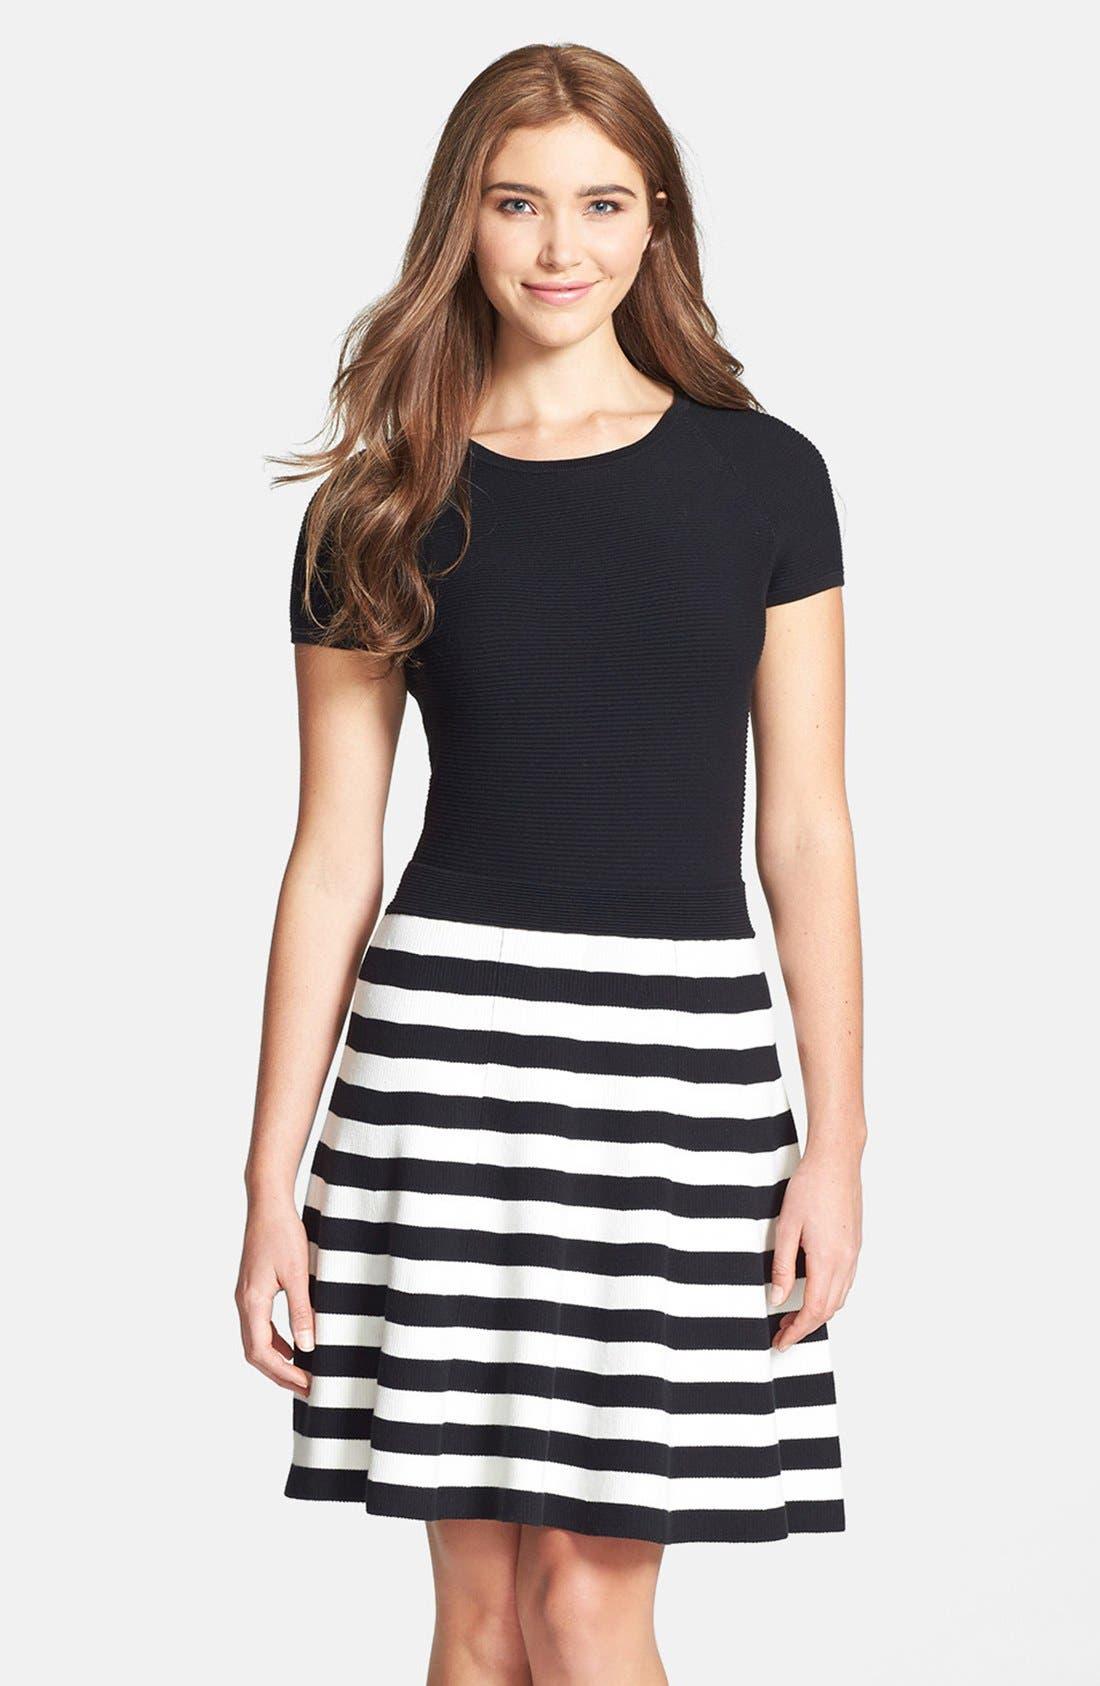 Alternate Image 1 Selected - Trina Turk 'Cosumel' Cotton & Modal Dress